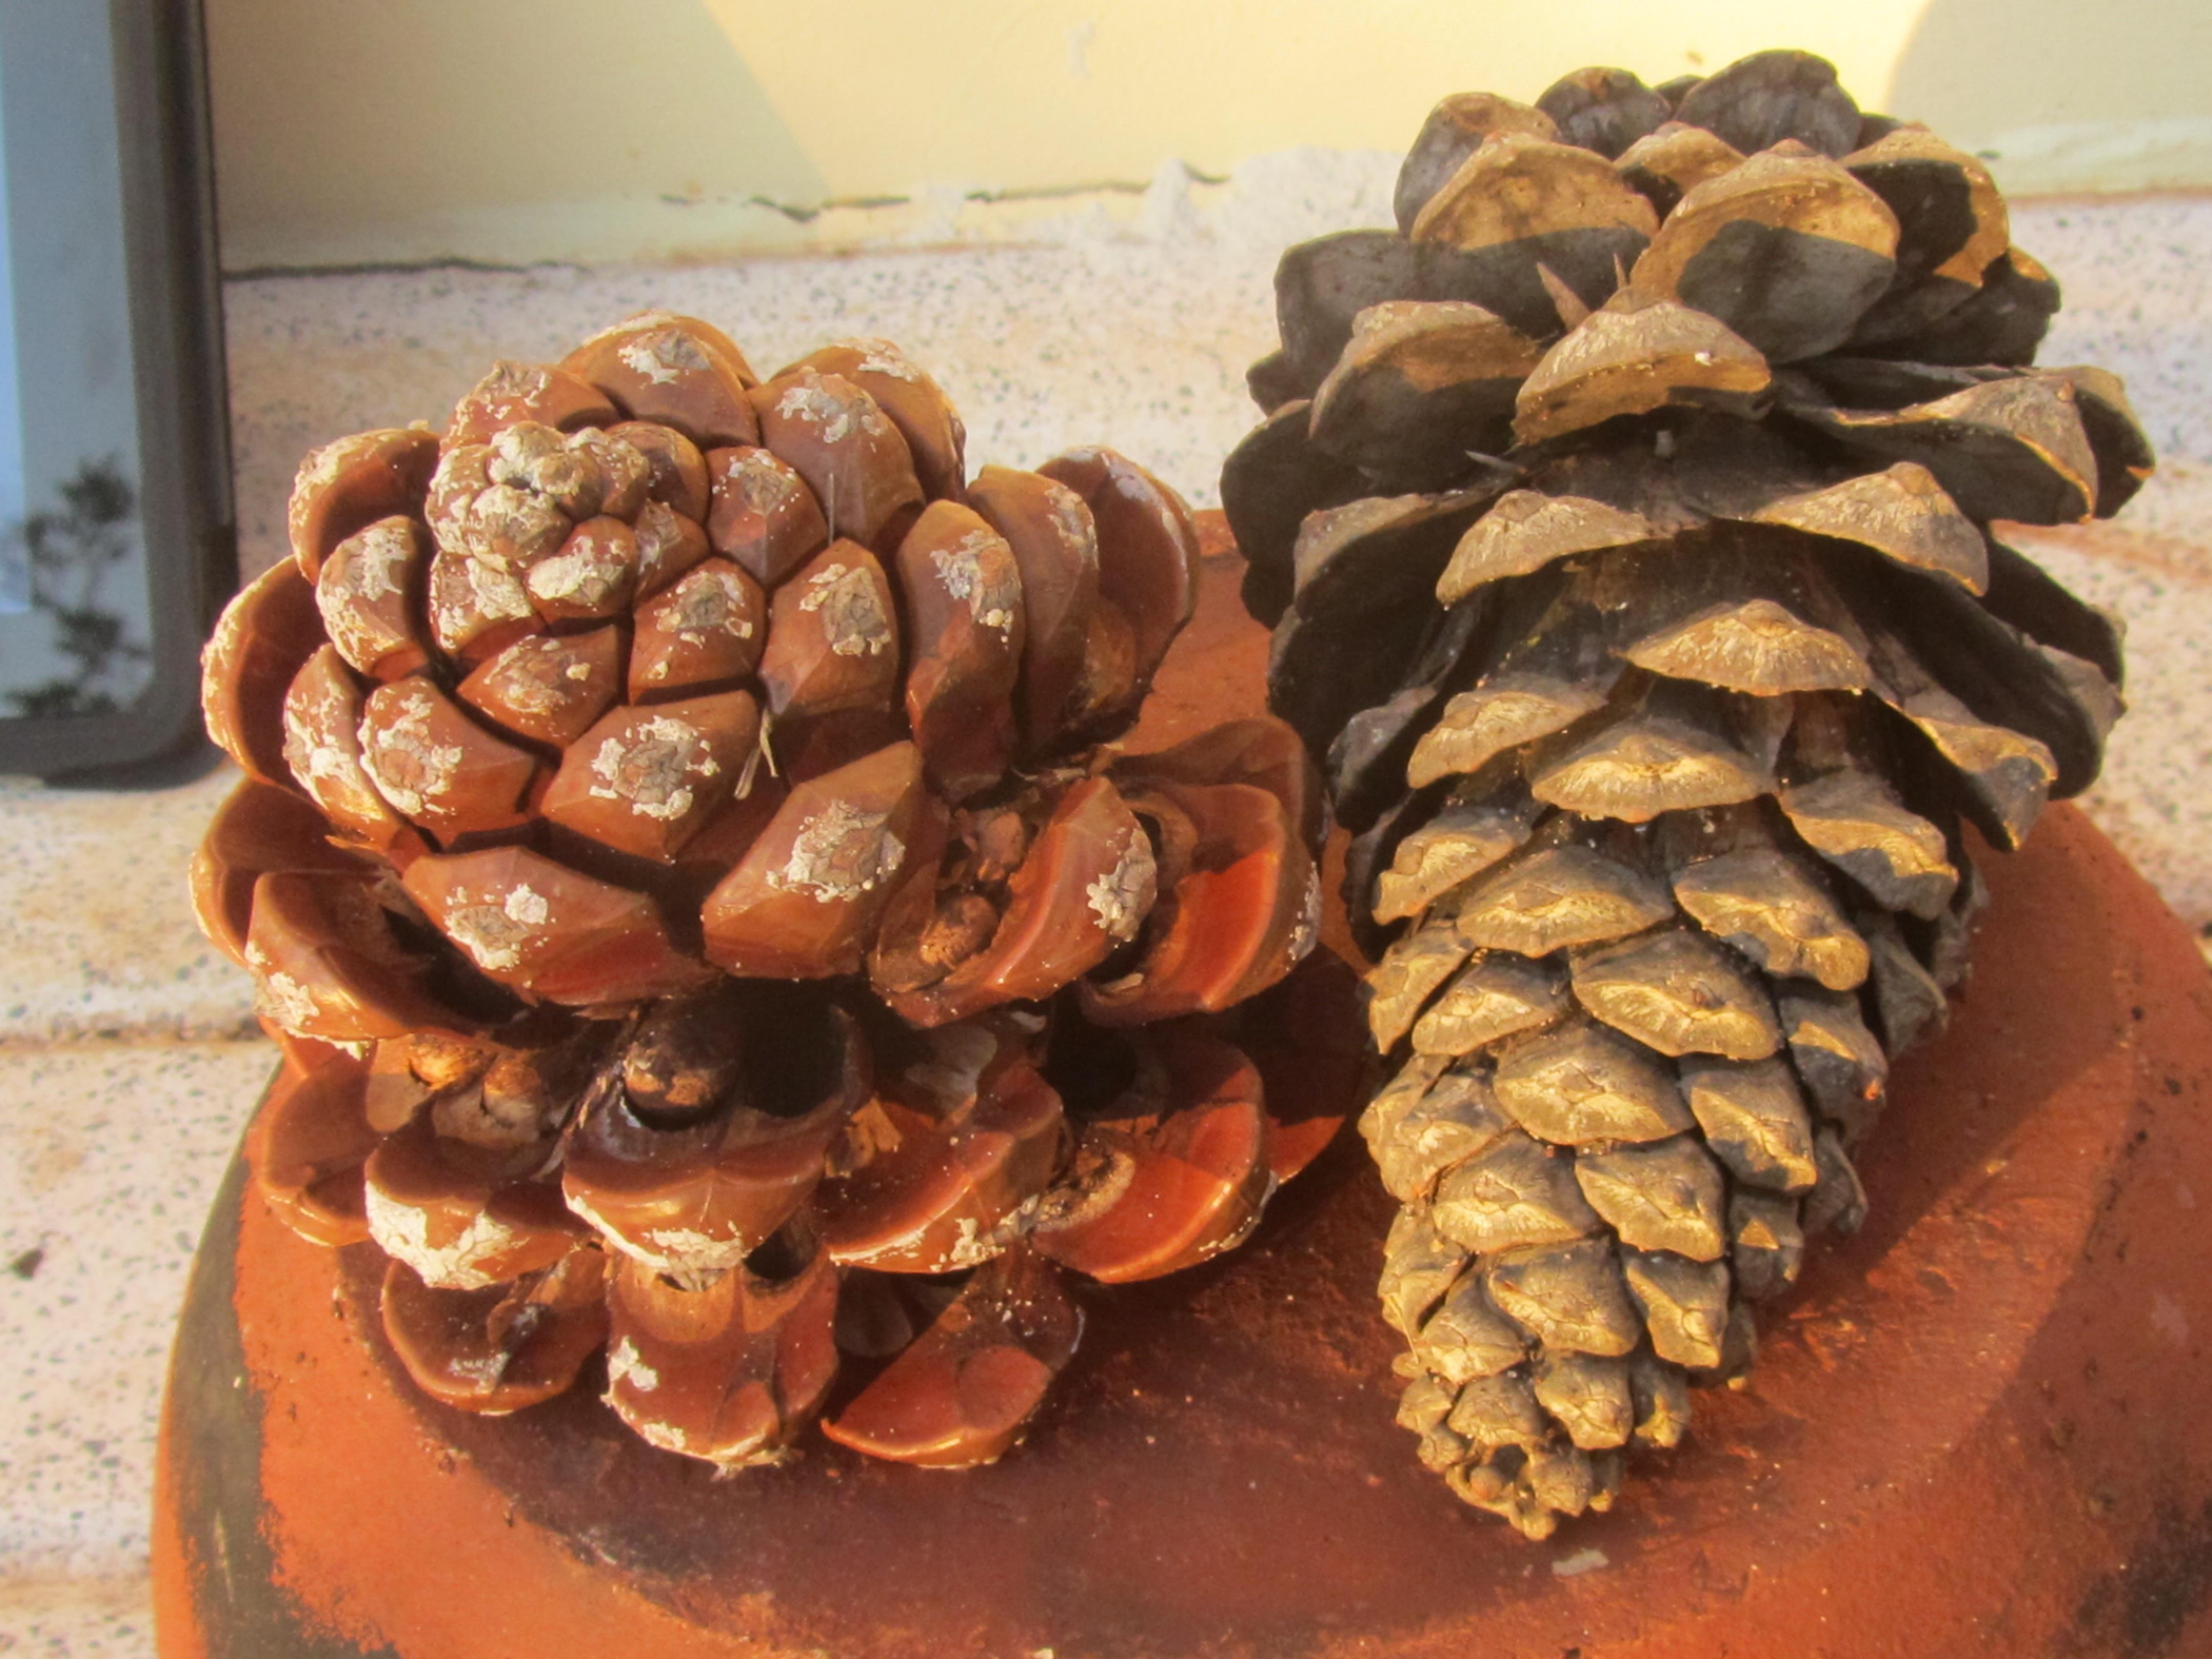 Fotos gratis : naturaleza, invierno, pino, decoración, plato, comida ...